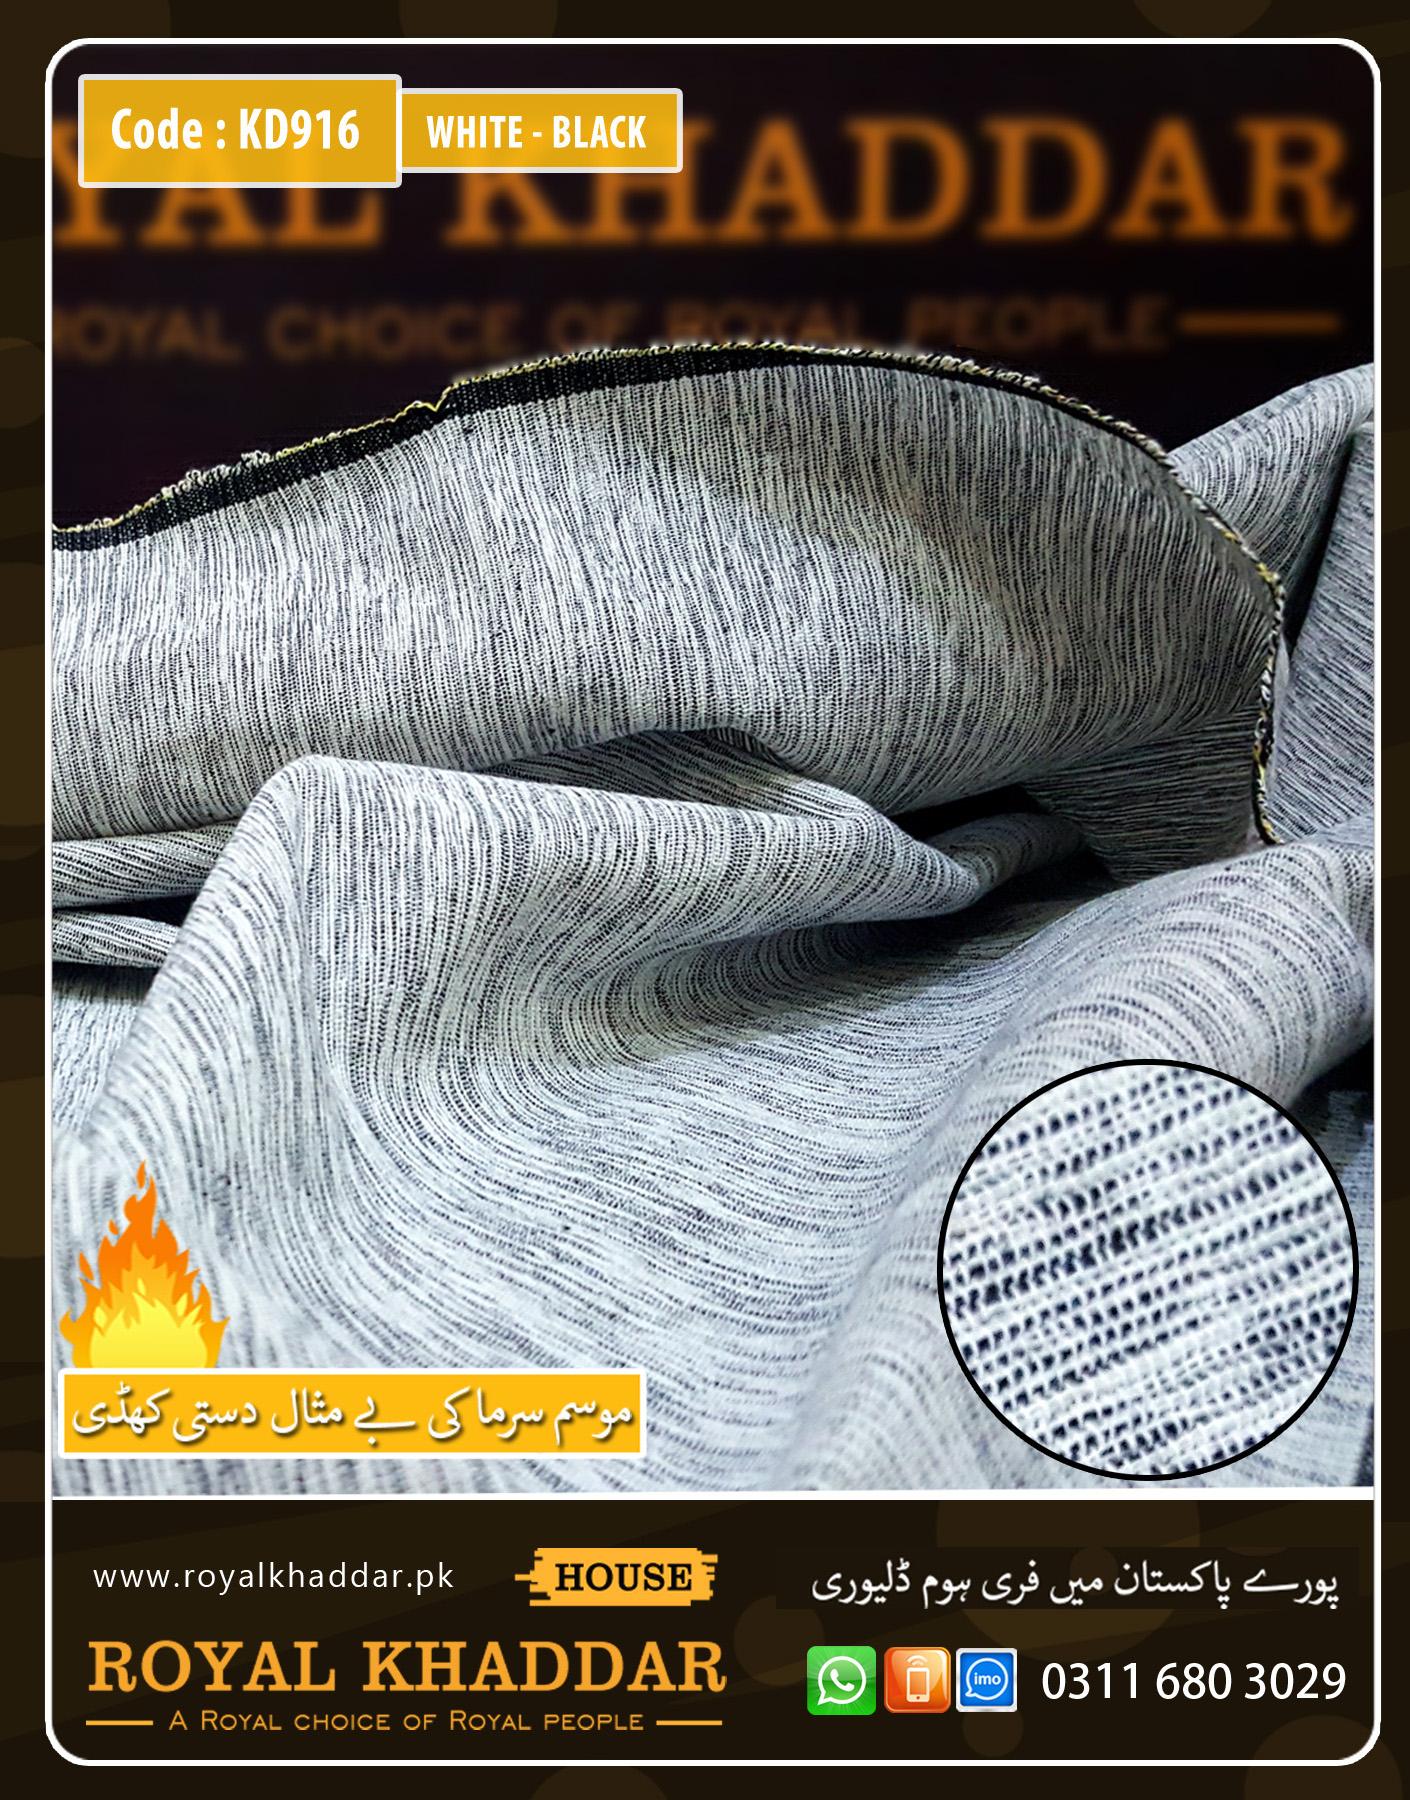 White - Black Handmade Khaddi